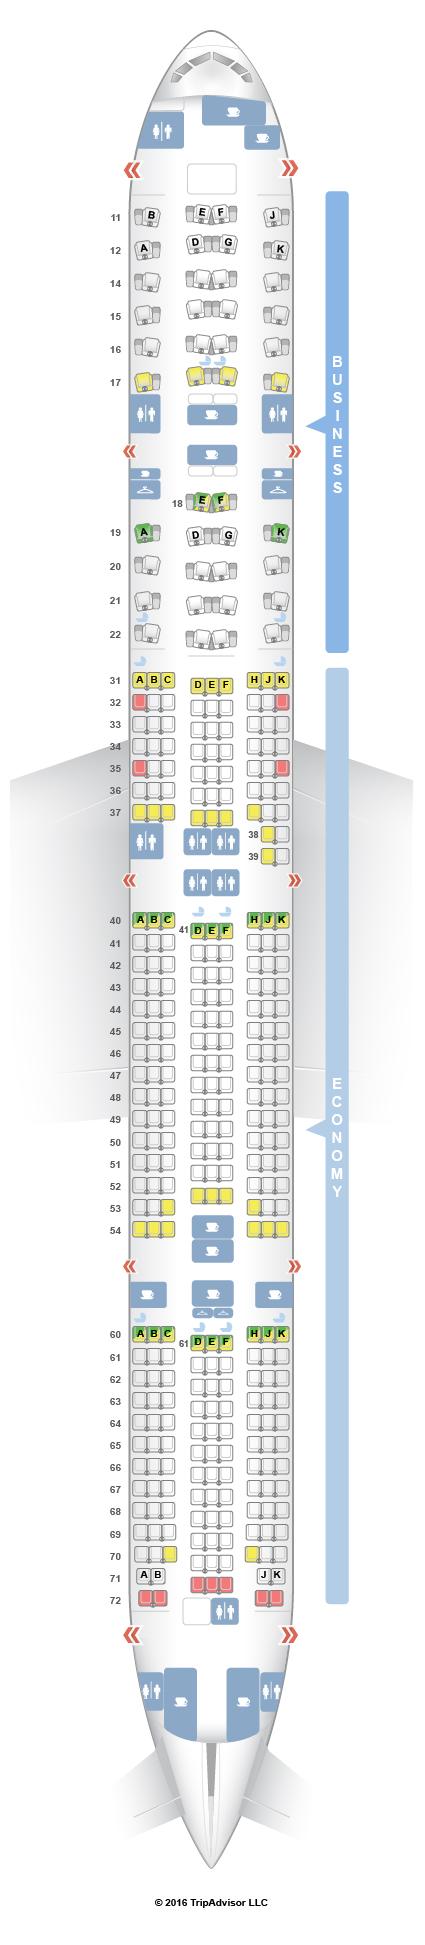 SeatGuru Seat Map THAI Boeing 777-300ER (77W) - photo#36